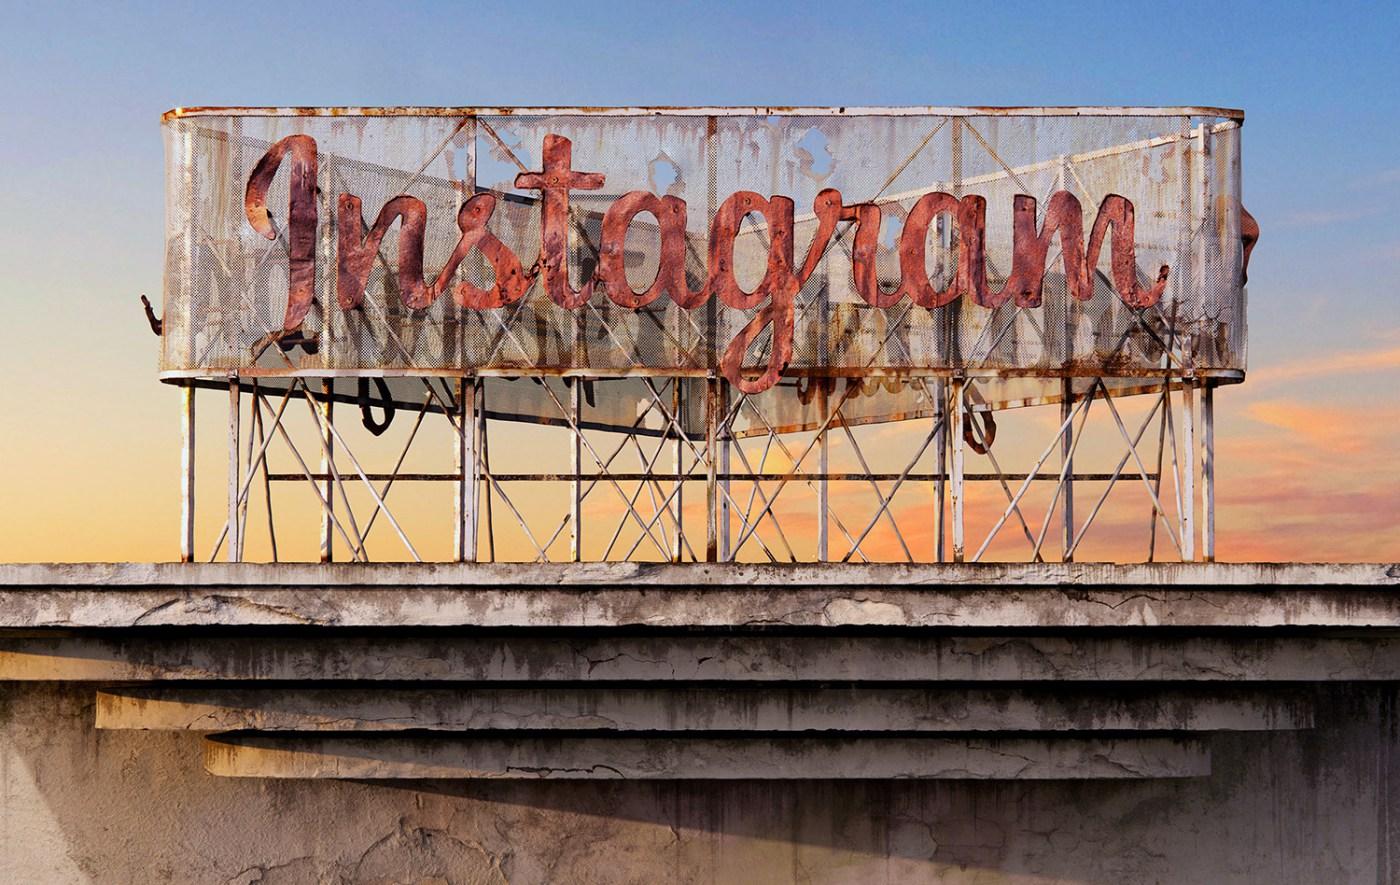 AndreiLacatusu social decay lettres logo enseigne typographie urbain urbex instagram - Social decay : les logos de Twitter, Facebook et Tinder transformés en enseignes vintage